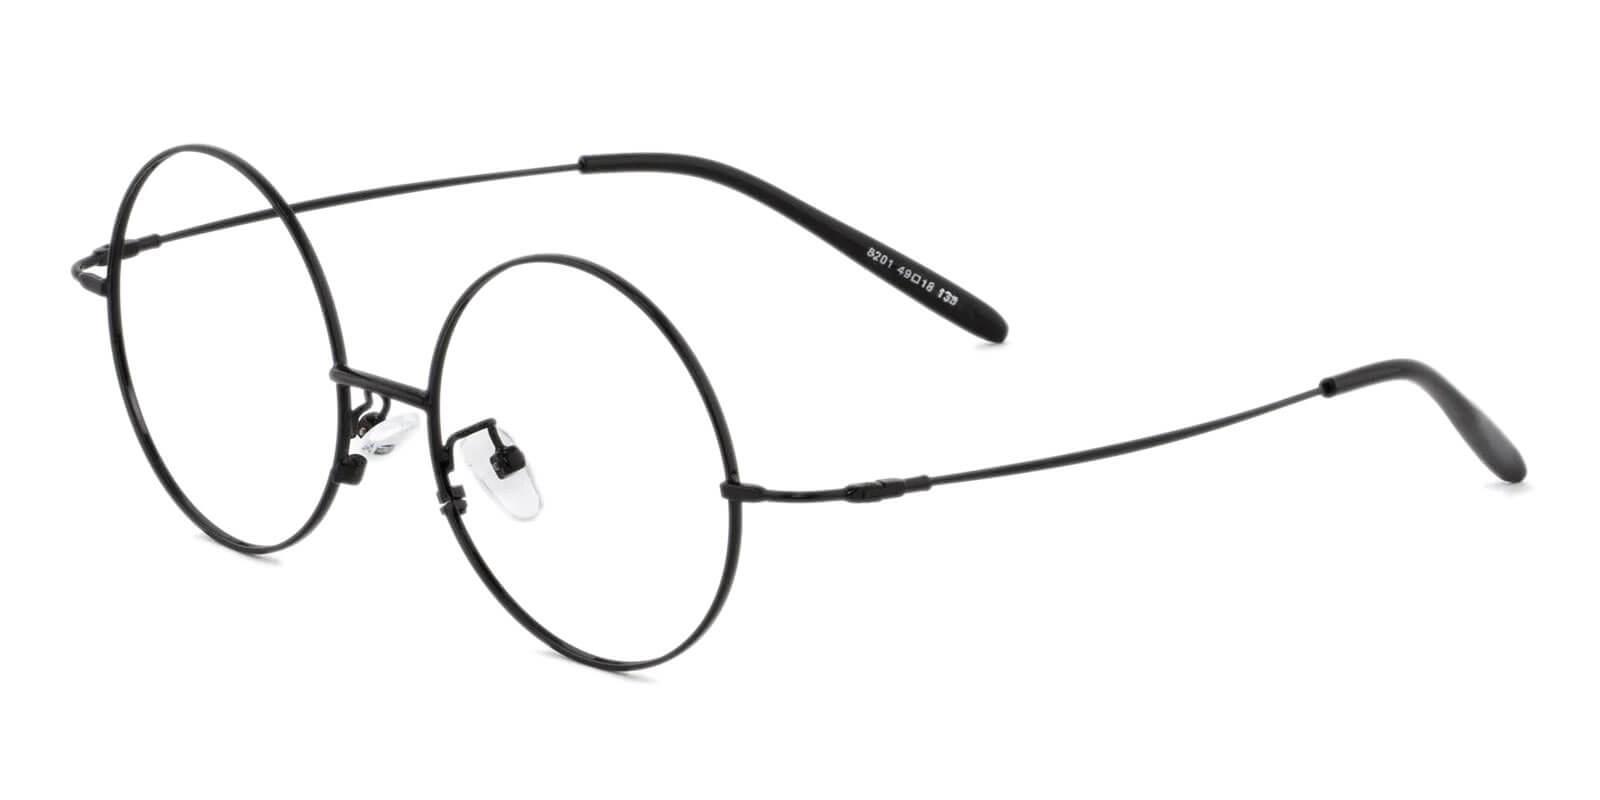 Mali Black Acetate , Metal Eyeglasses , Lightweight , NosePads Frames from ABBE Glasses